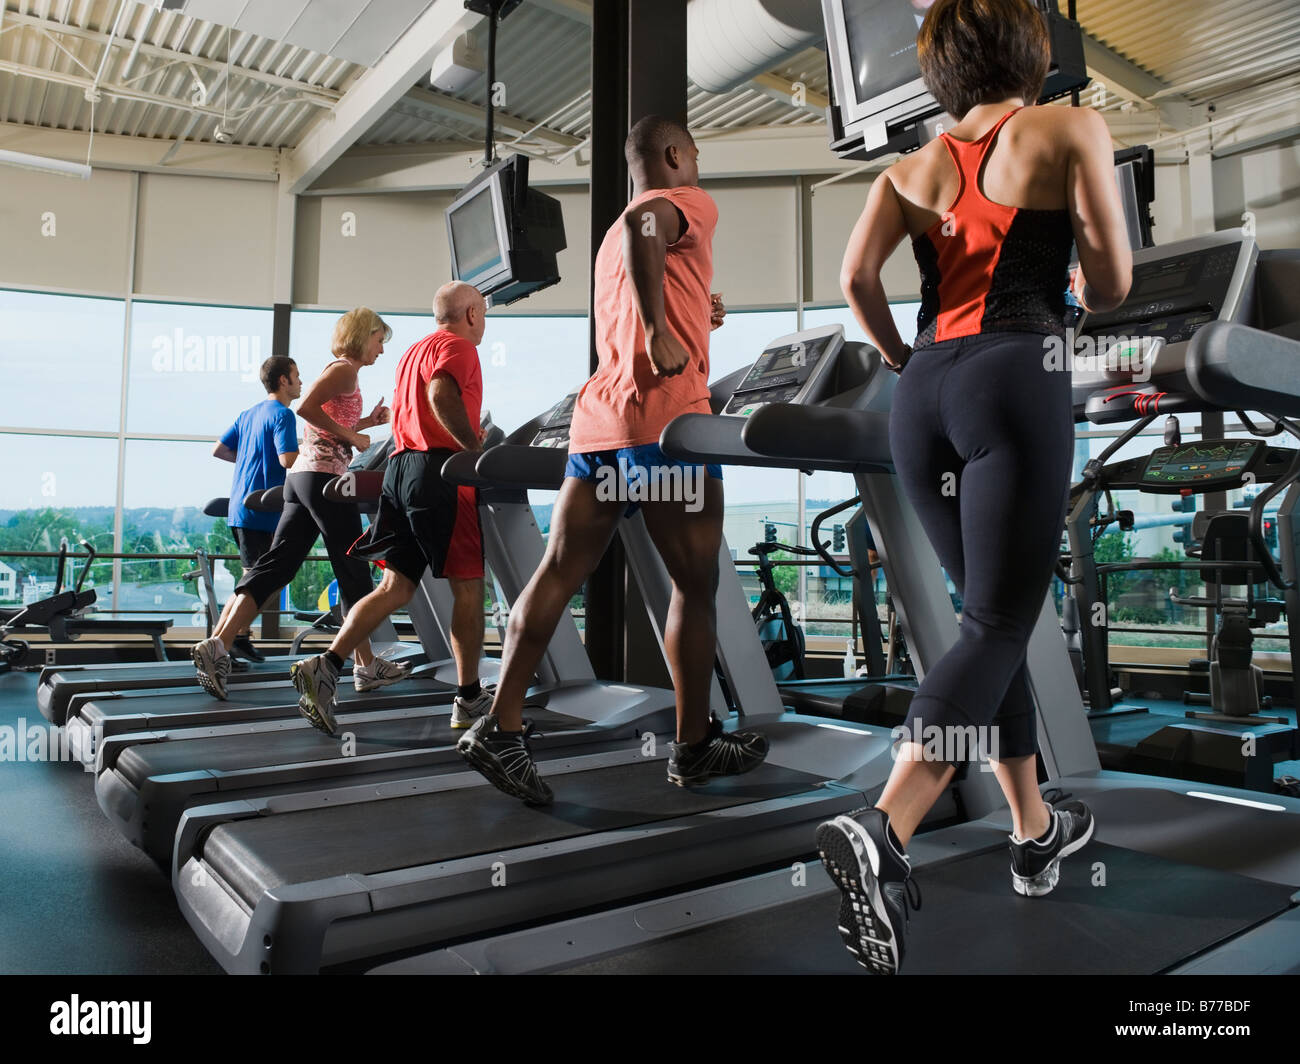 Men and women running on treadmills - Stock Image